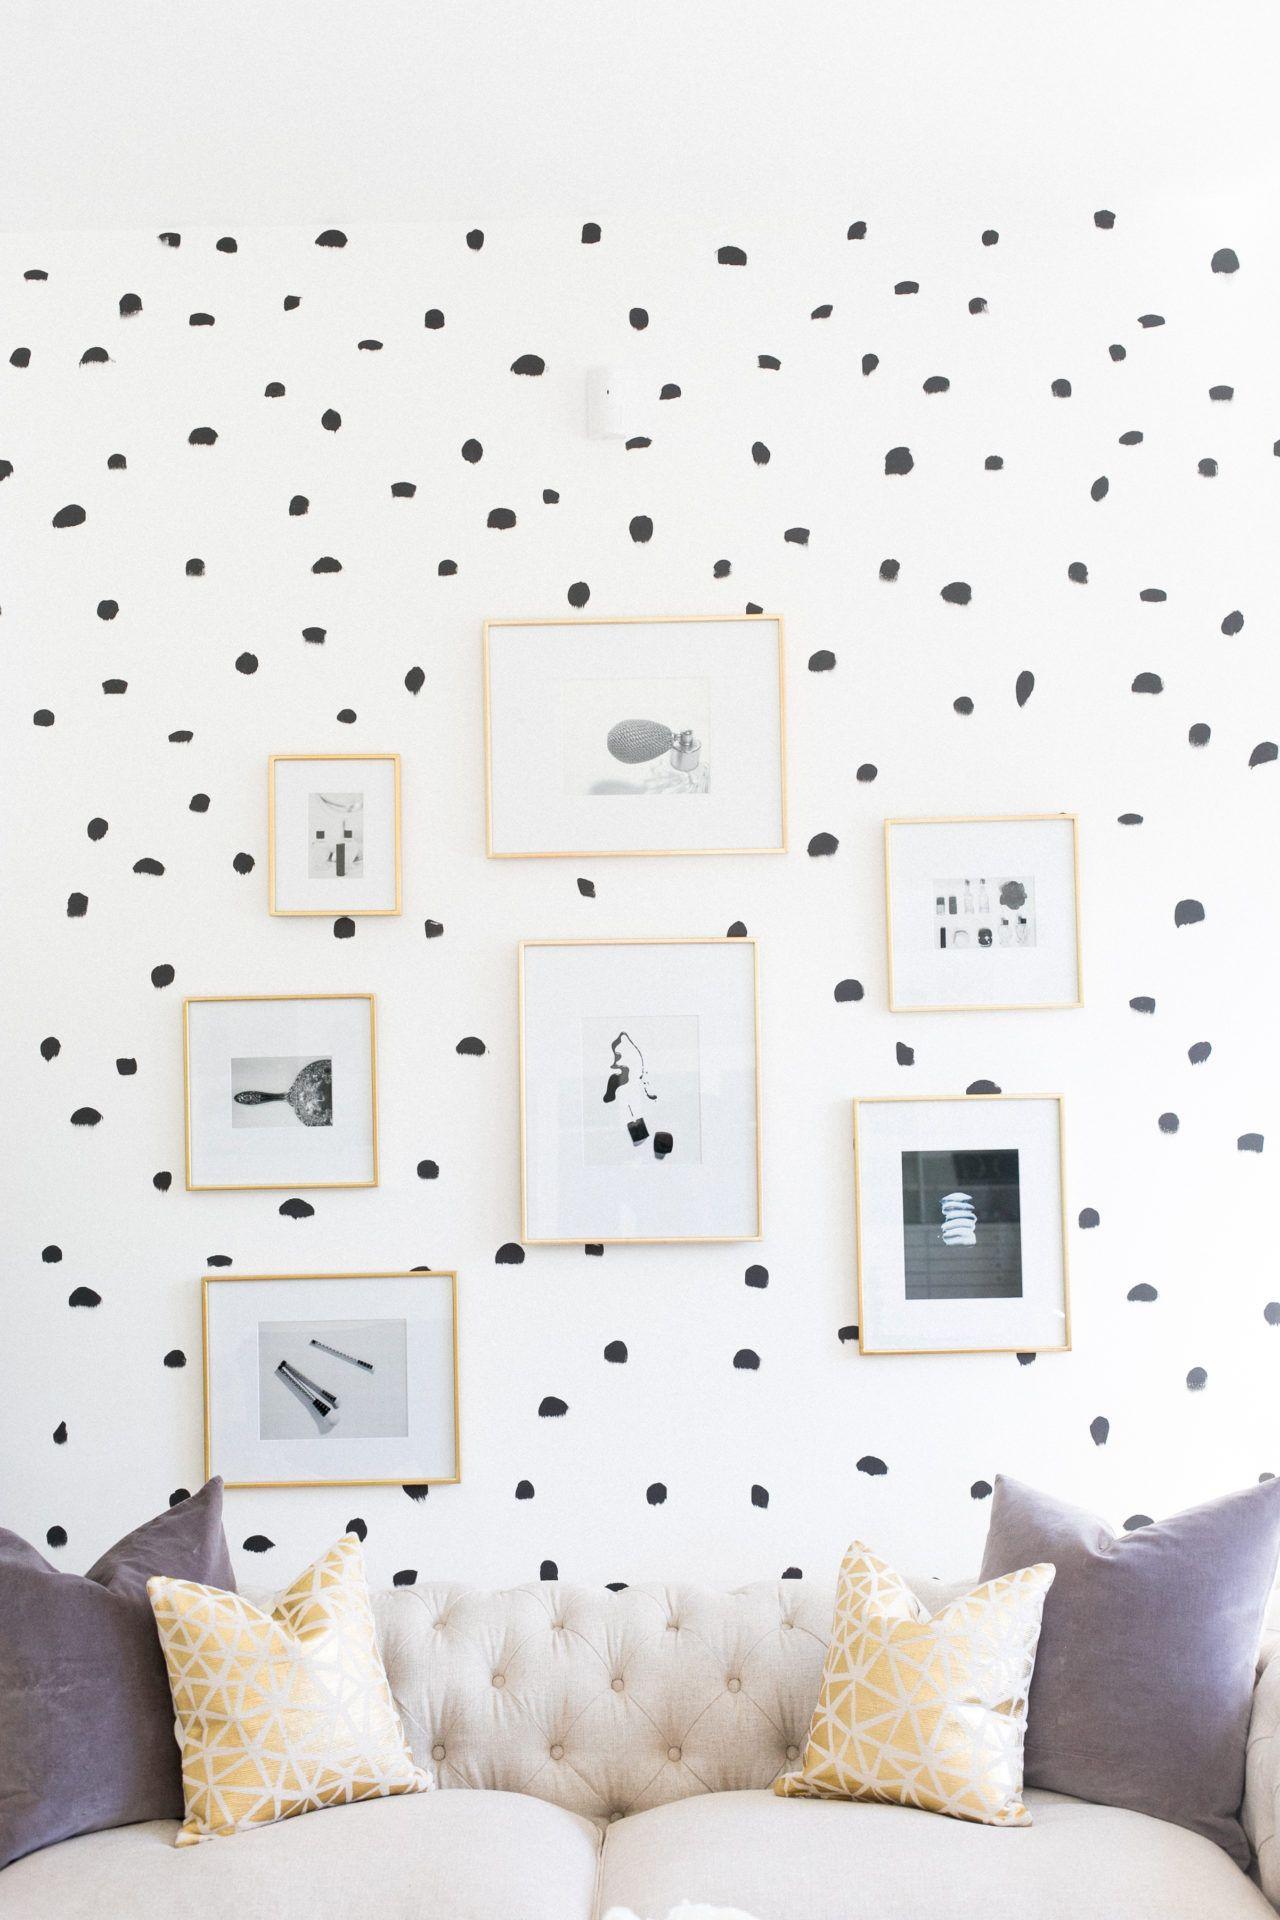 Diy Brush Stroke Inspired Polka Dot Wall Polka Dot Walls Wall Decor Bedroom Statement Walls Bedroom